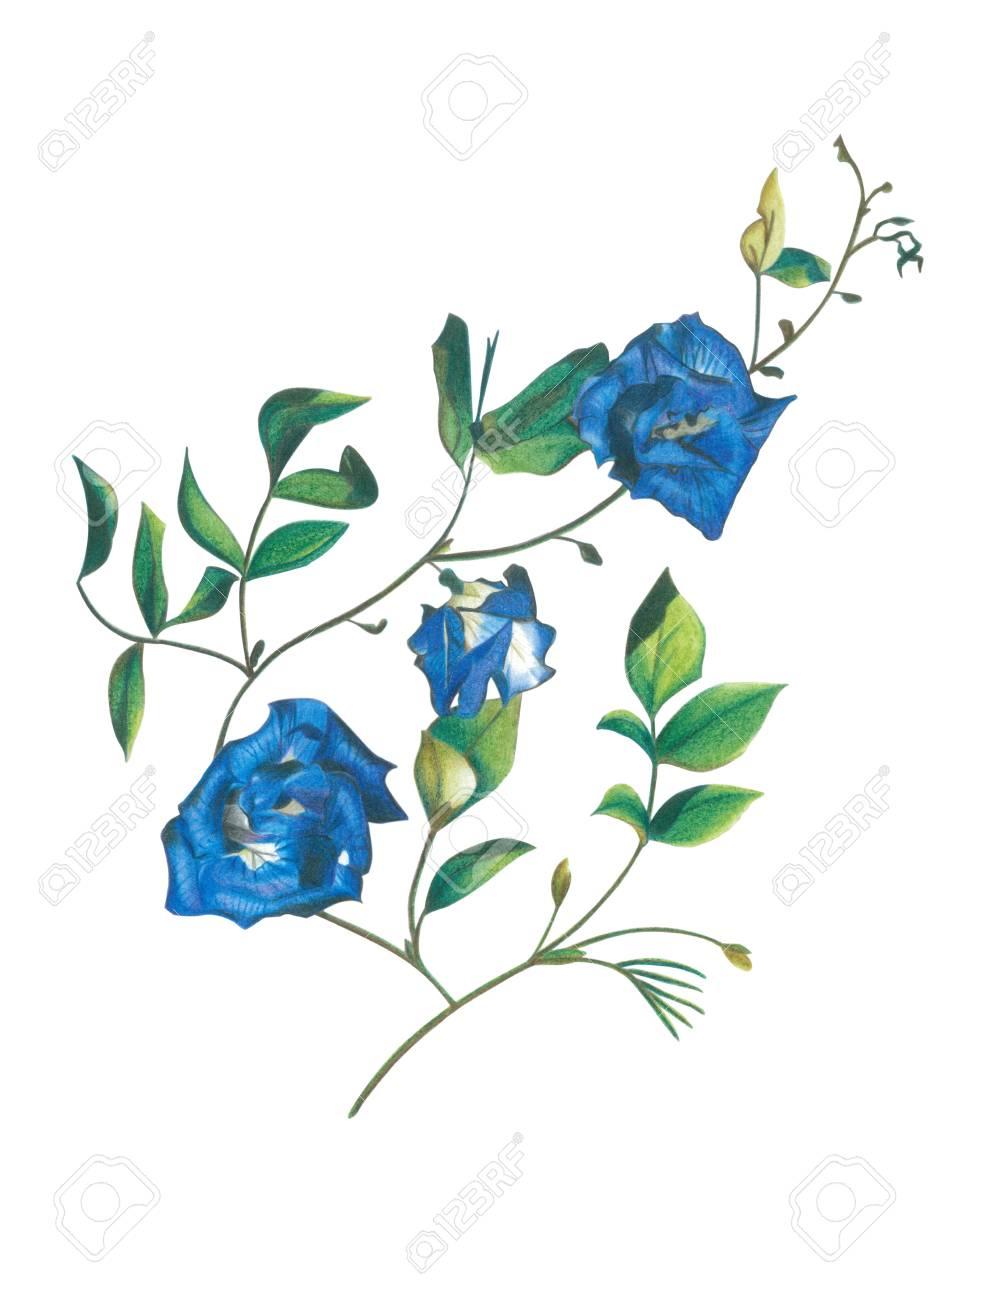 Mano Dibujar Flores De Guisante De Mariposa Por Lápiz De Color Fotos